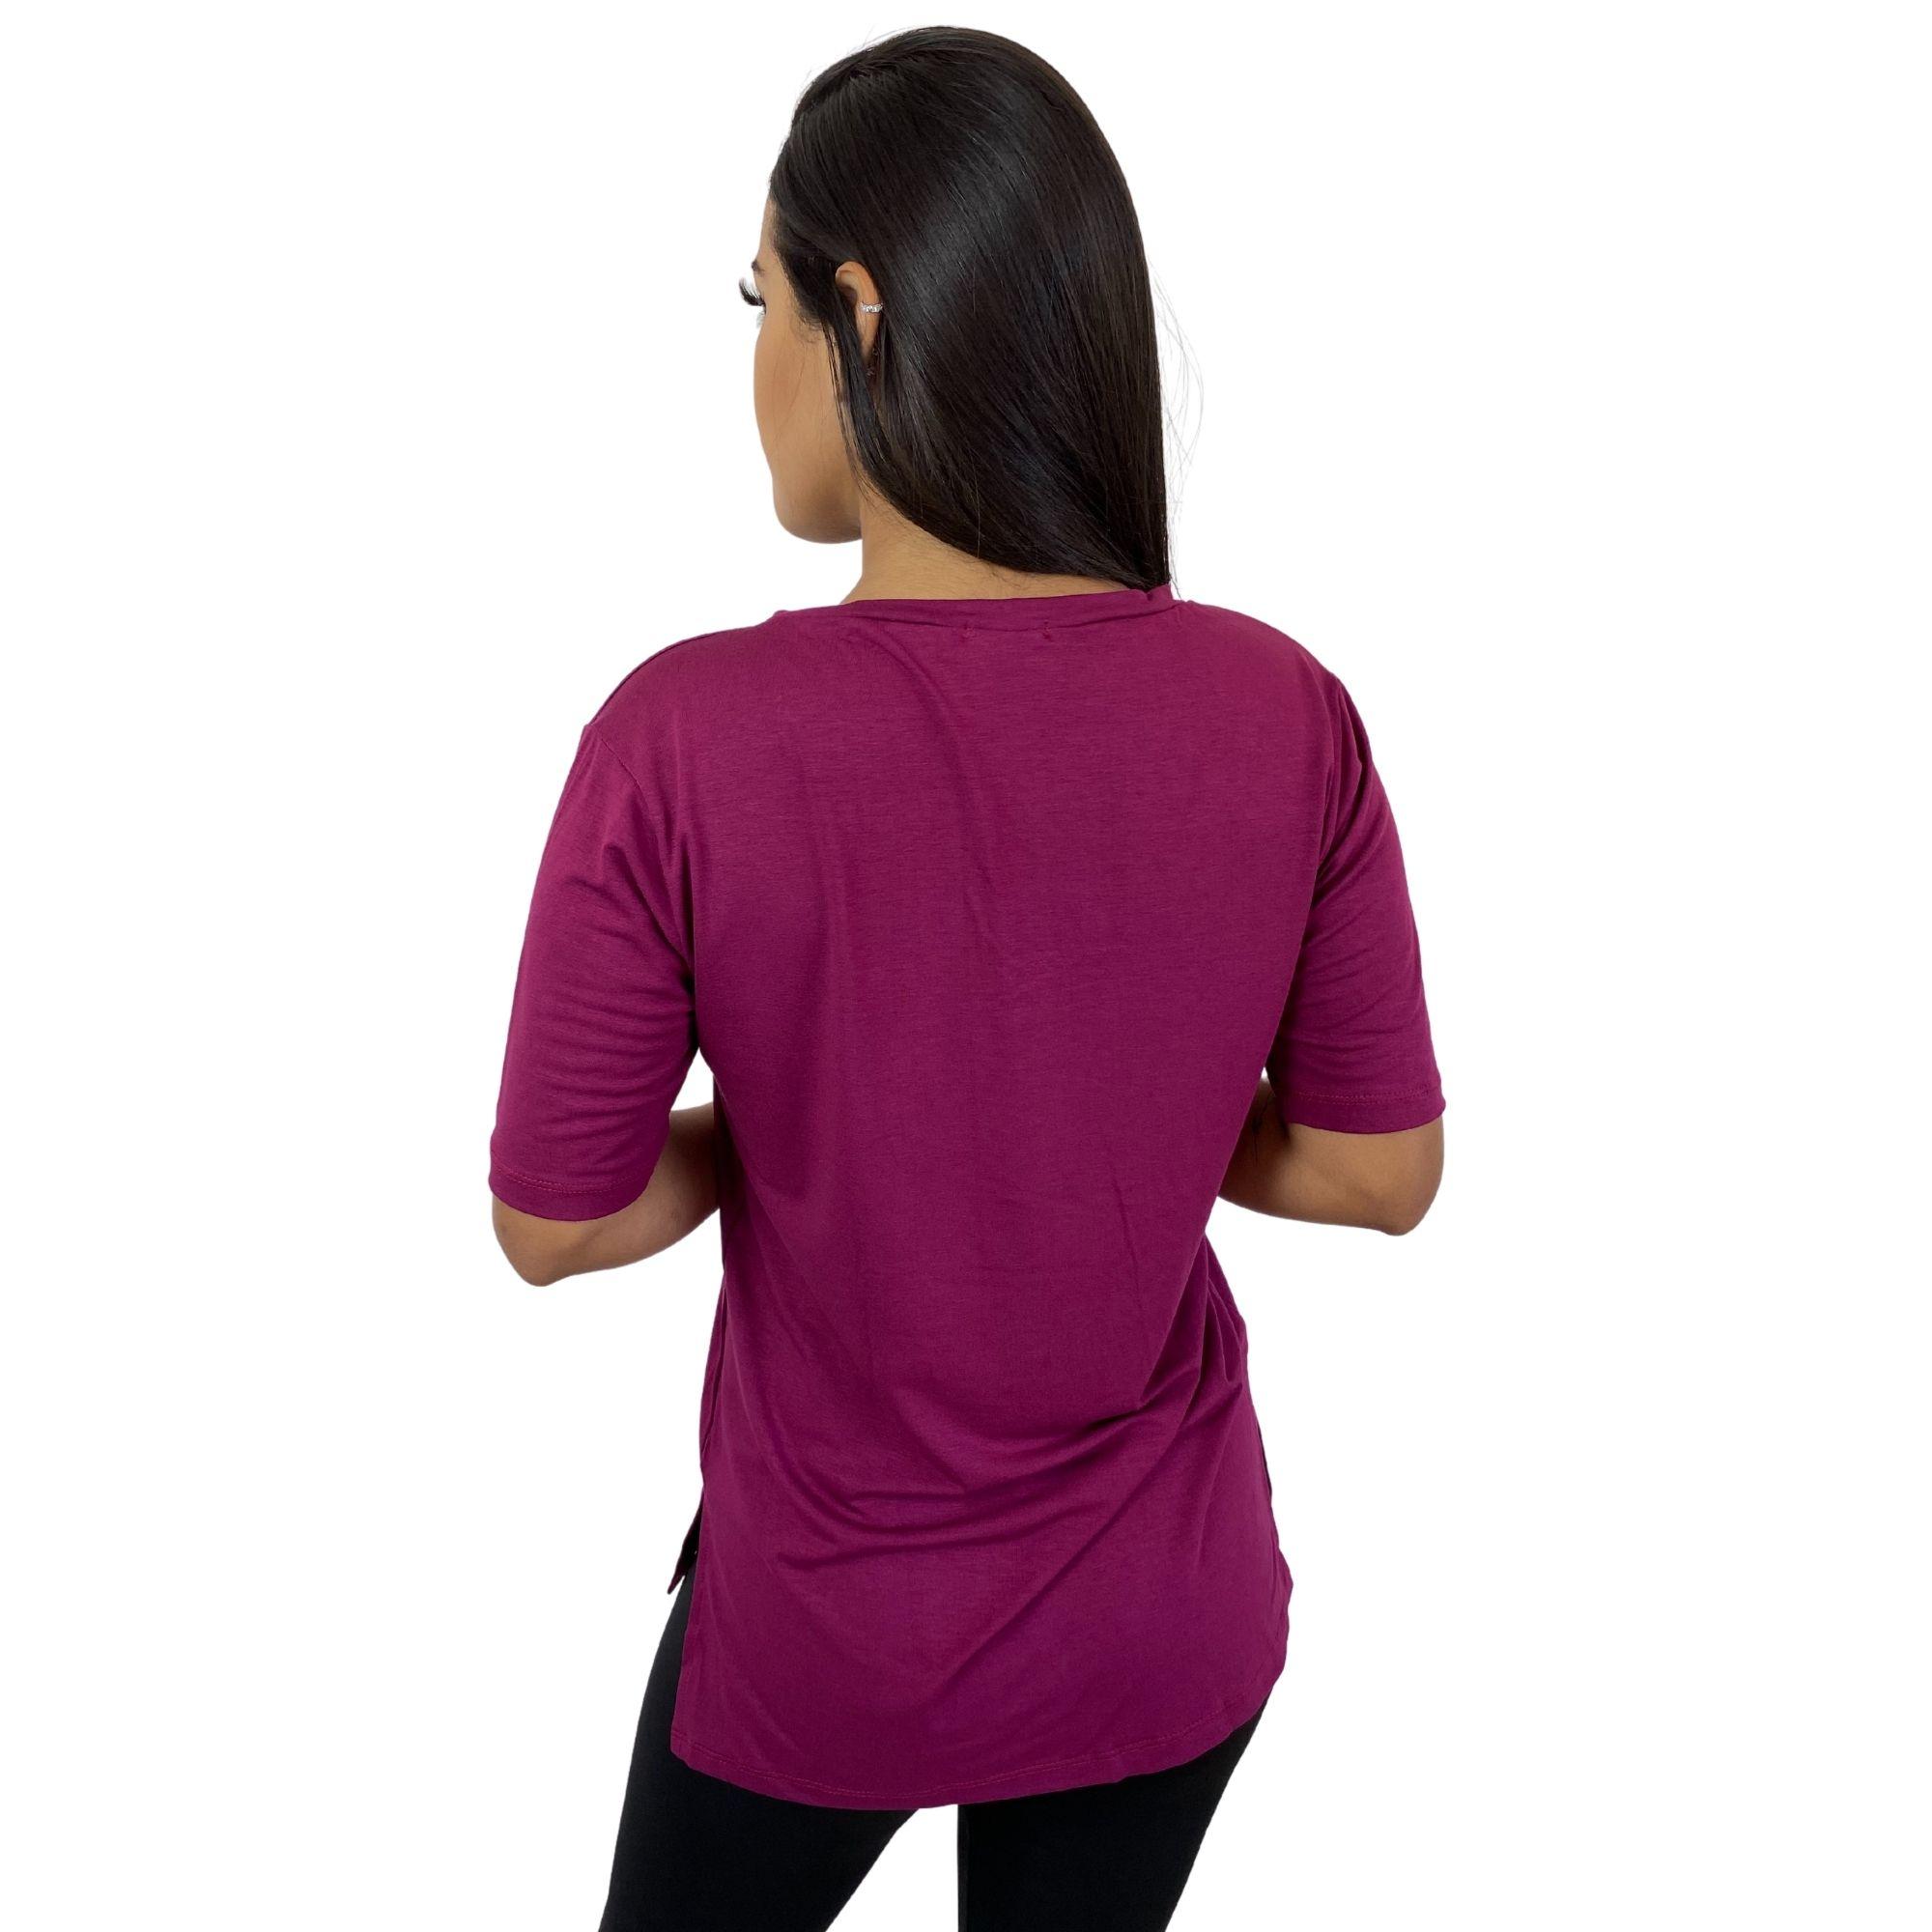 Camiseta Feminina Tapa Bumbum Manga Curta Vinho